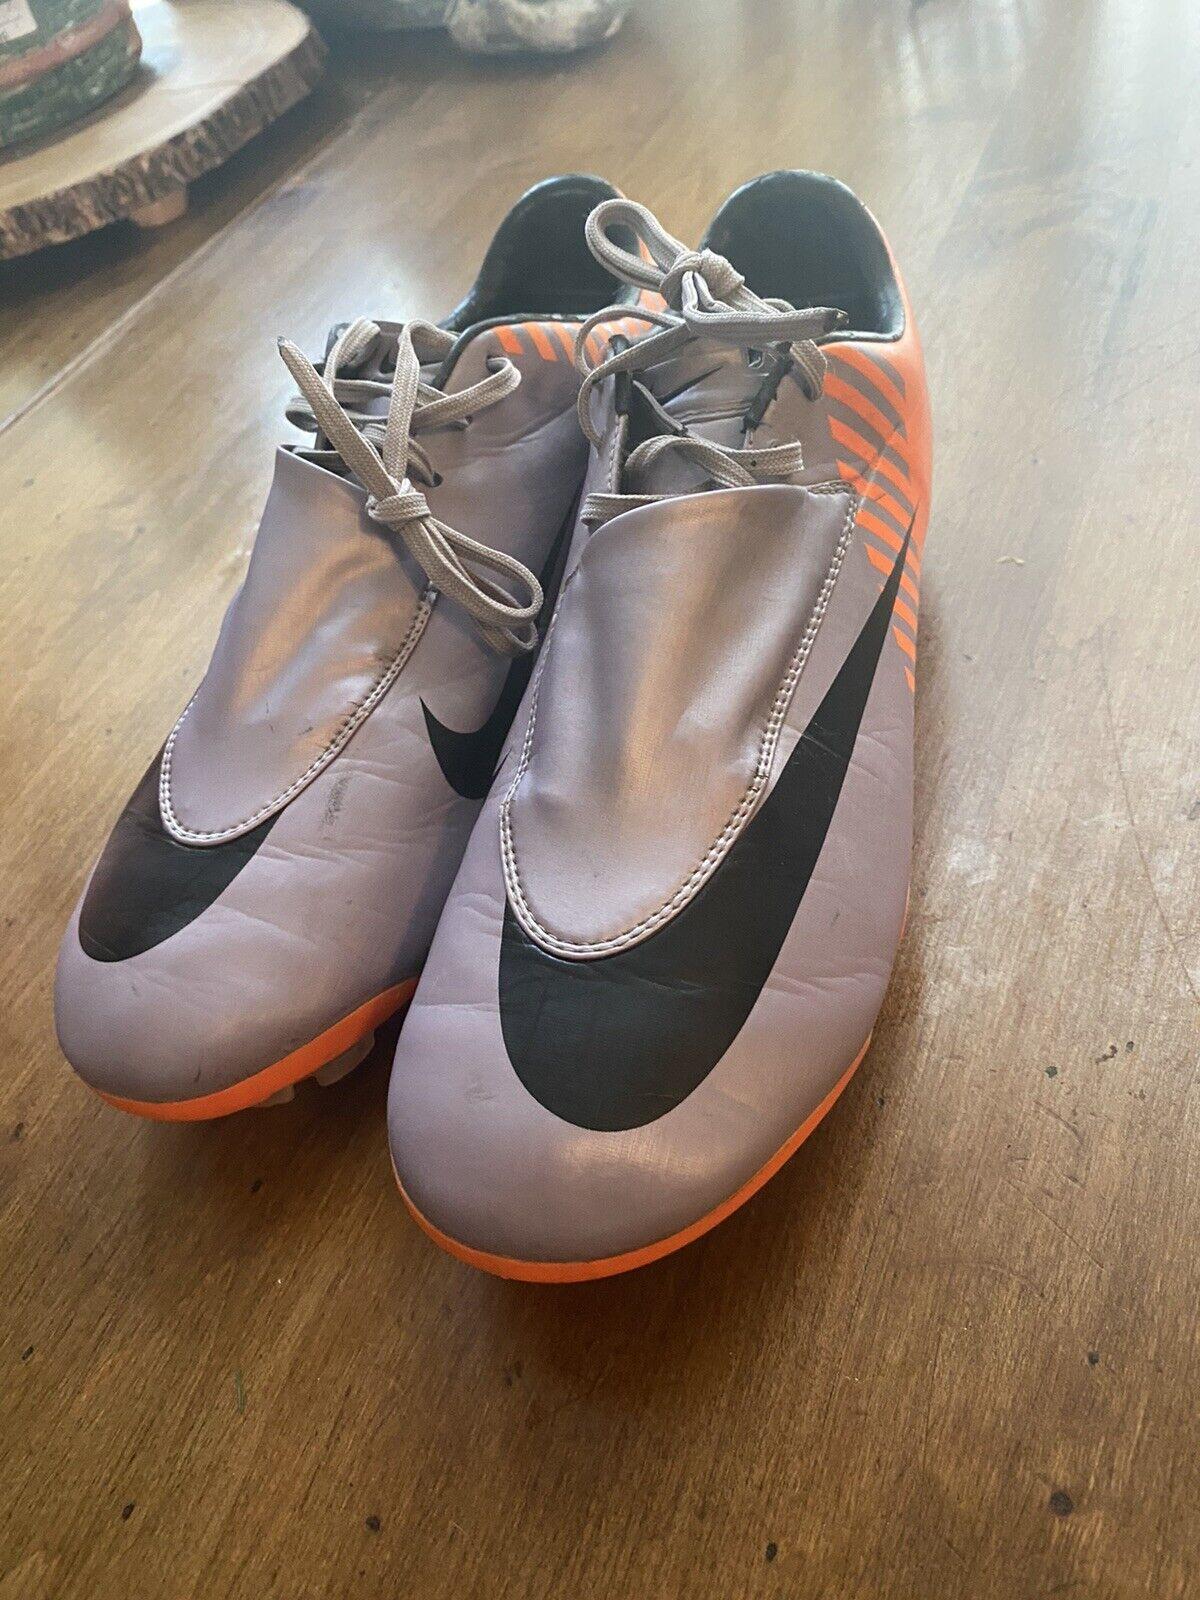 esencia menos Fragante  Nike Mercurial Vapor VI WC 2010 World Cup US 10.5 Soccer Cleats for sale  online | eBay